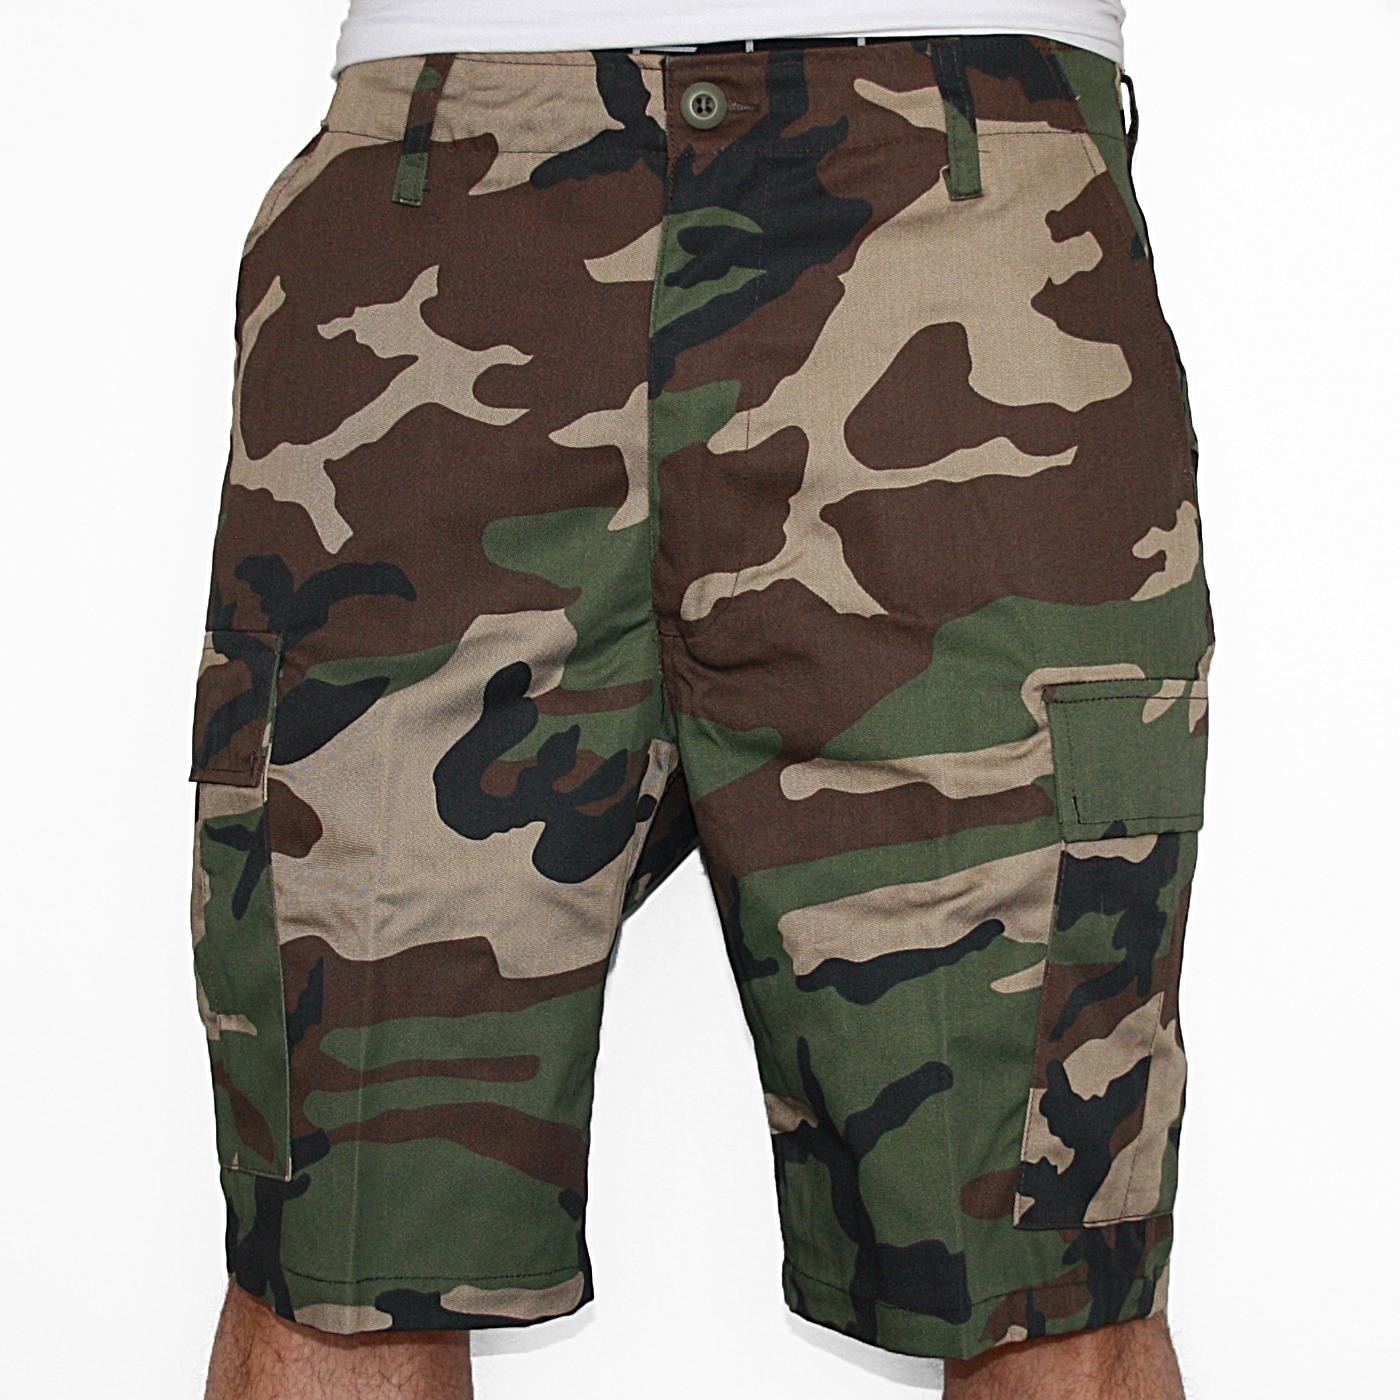 Army Shorts army shorts woodland. loading zoom FGNQLYQ